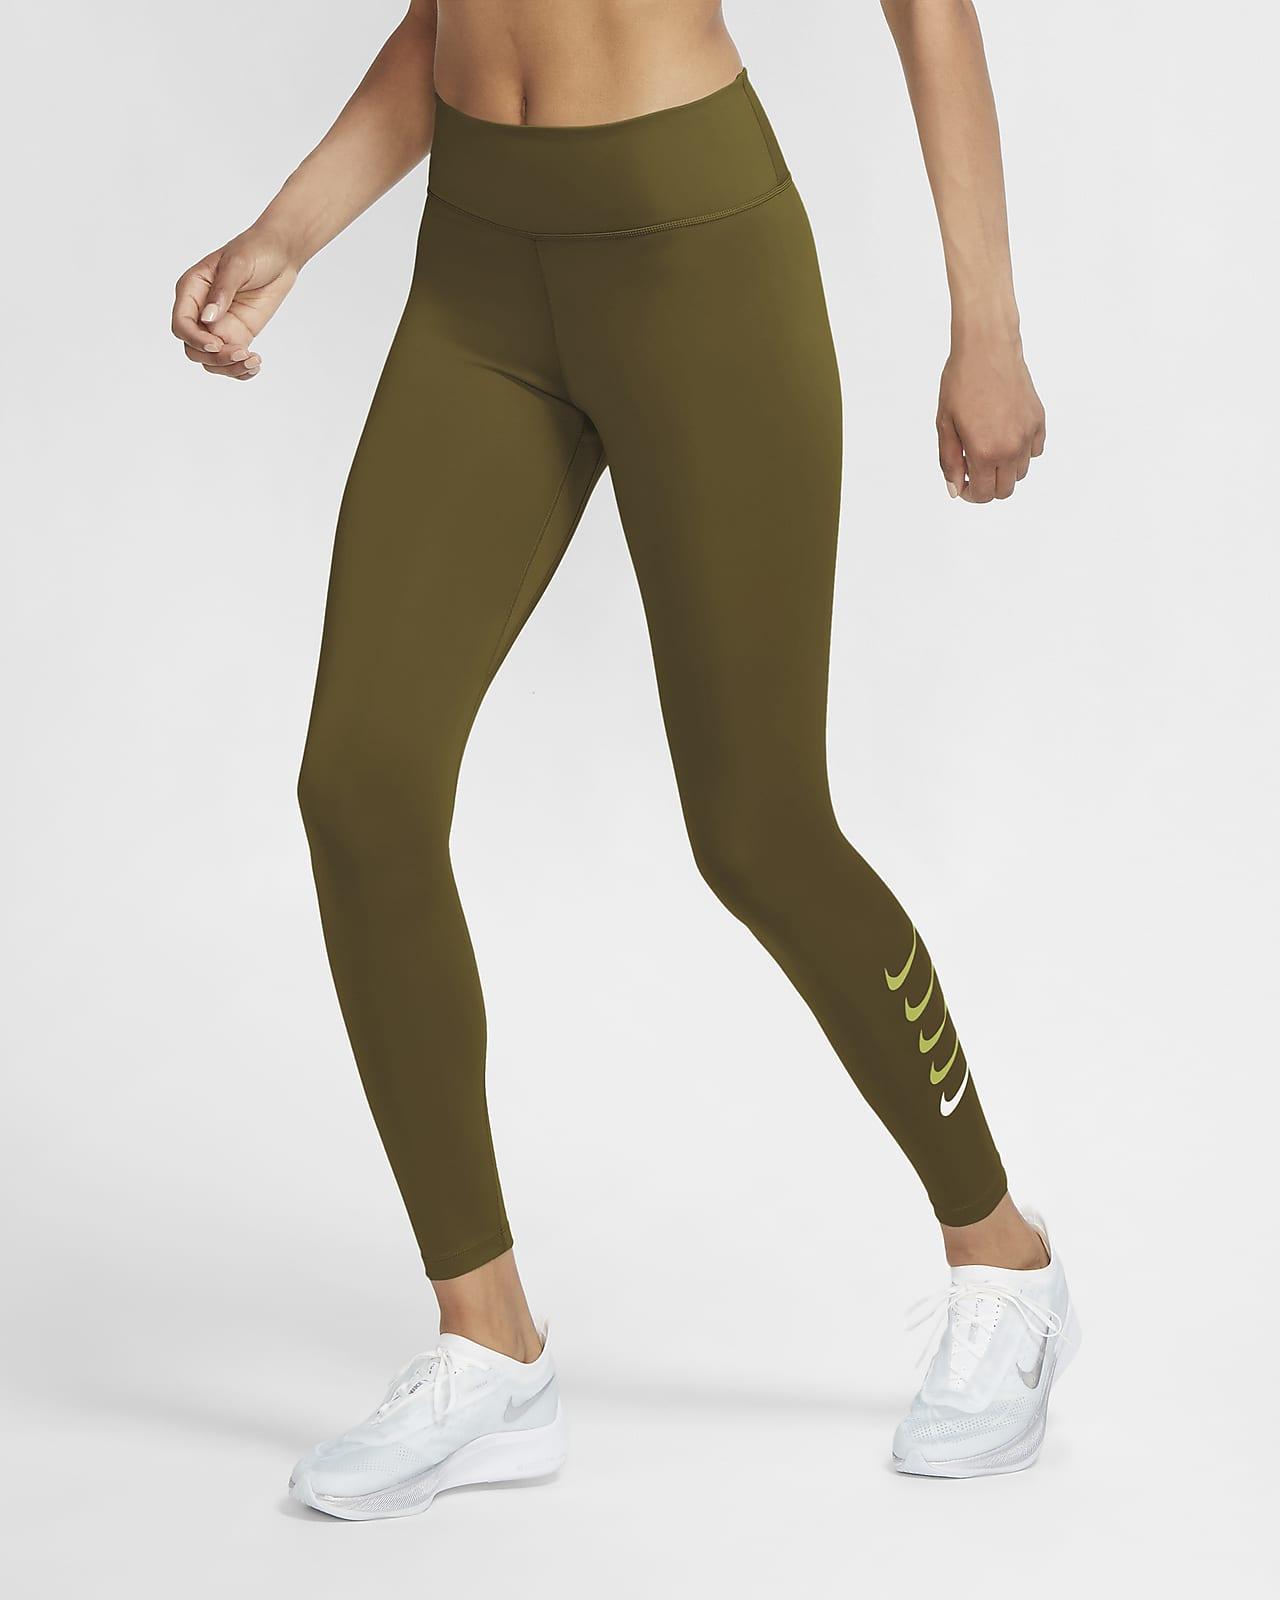 Nike Swoosh Run Women's 7/8 Running Leggings